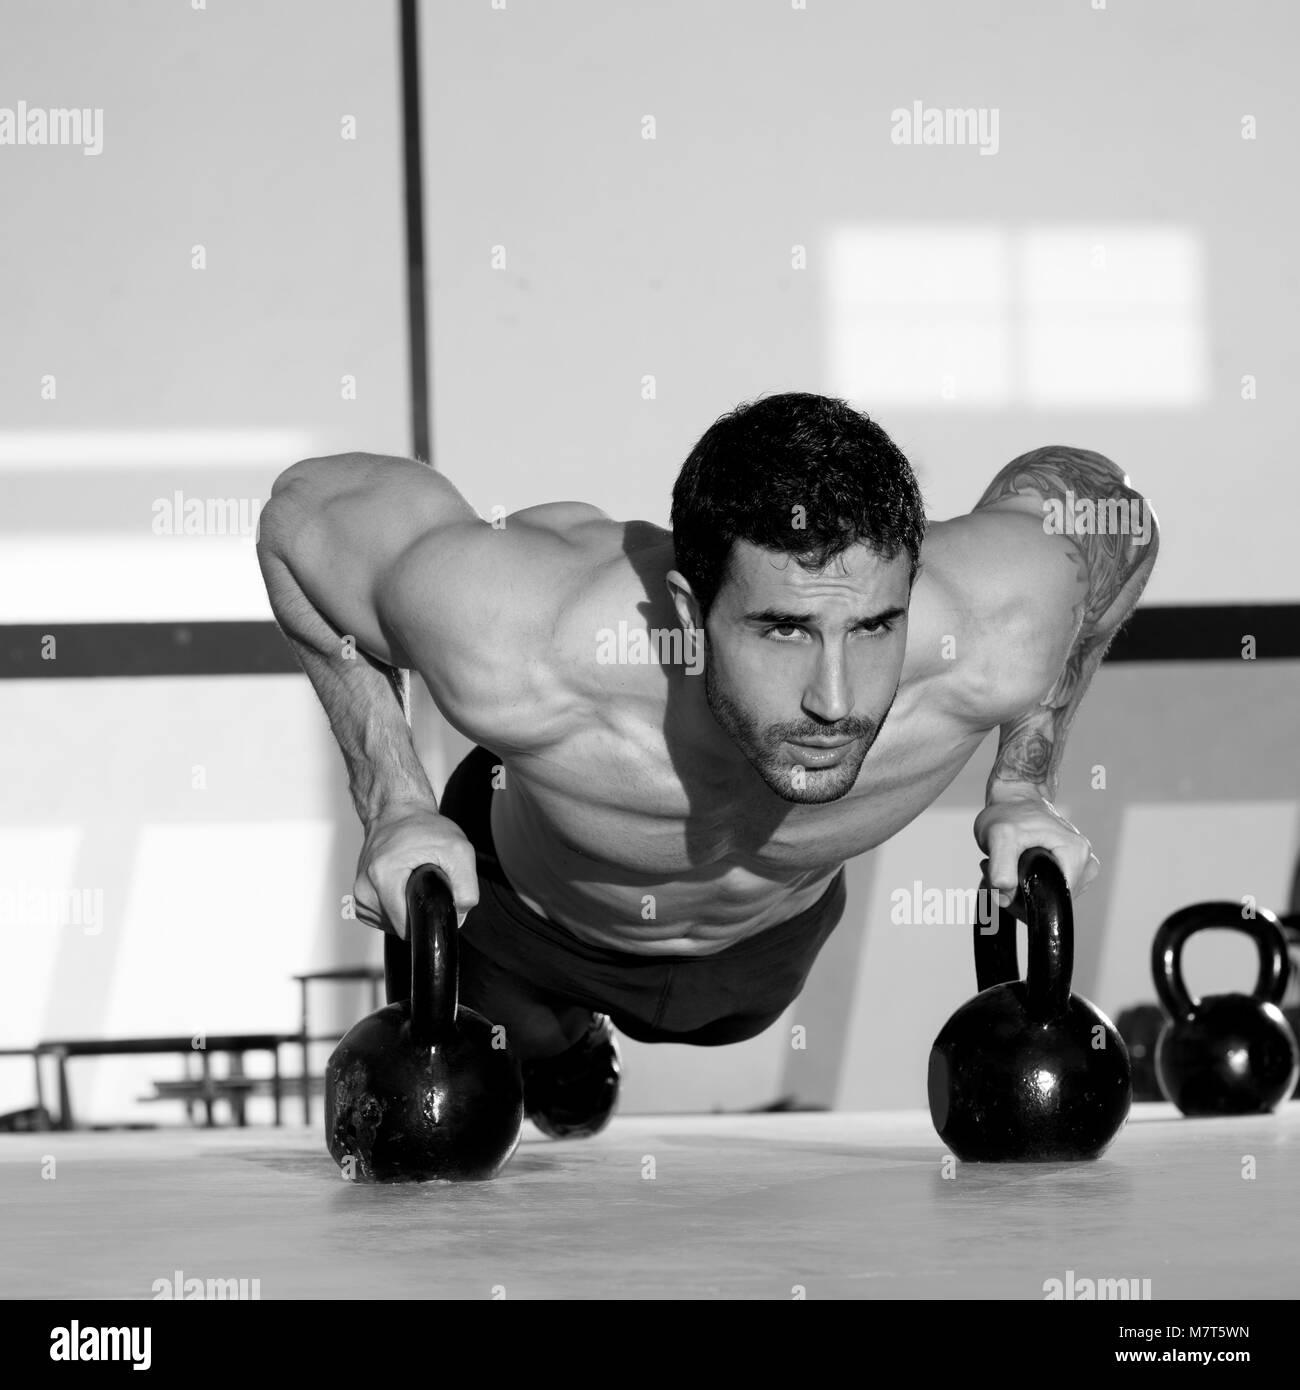 hombres y mujeres fitness, deporte culturismo y pesas - Stock Image